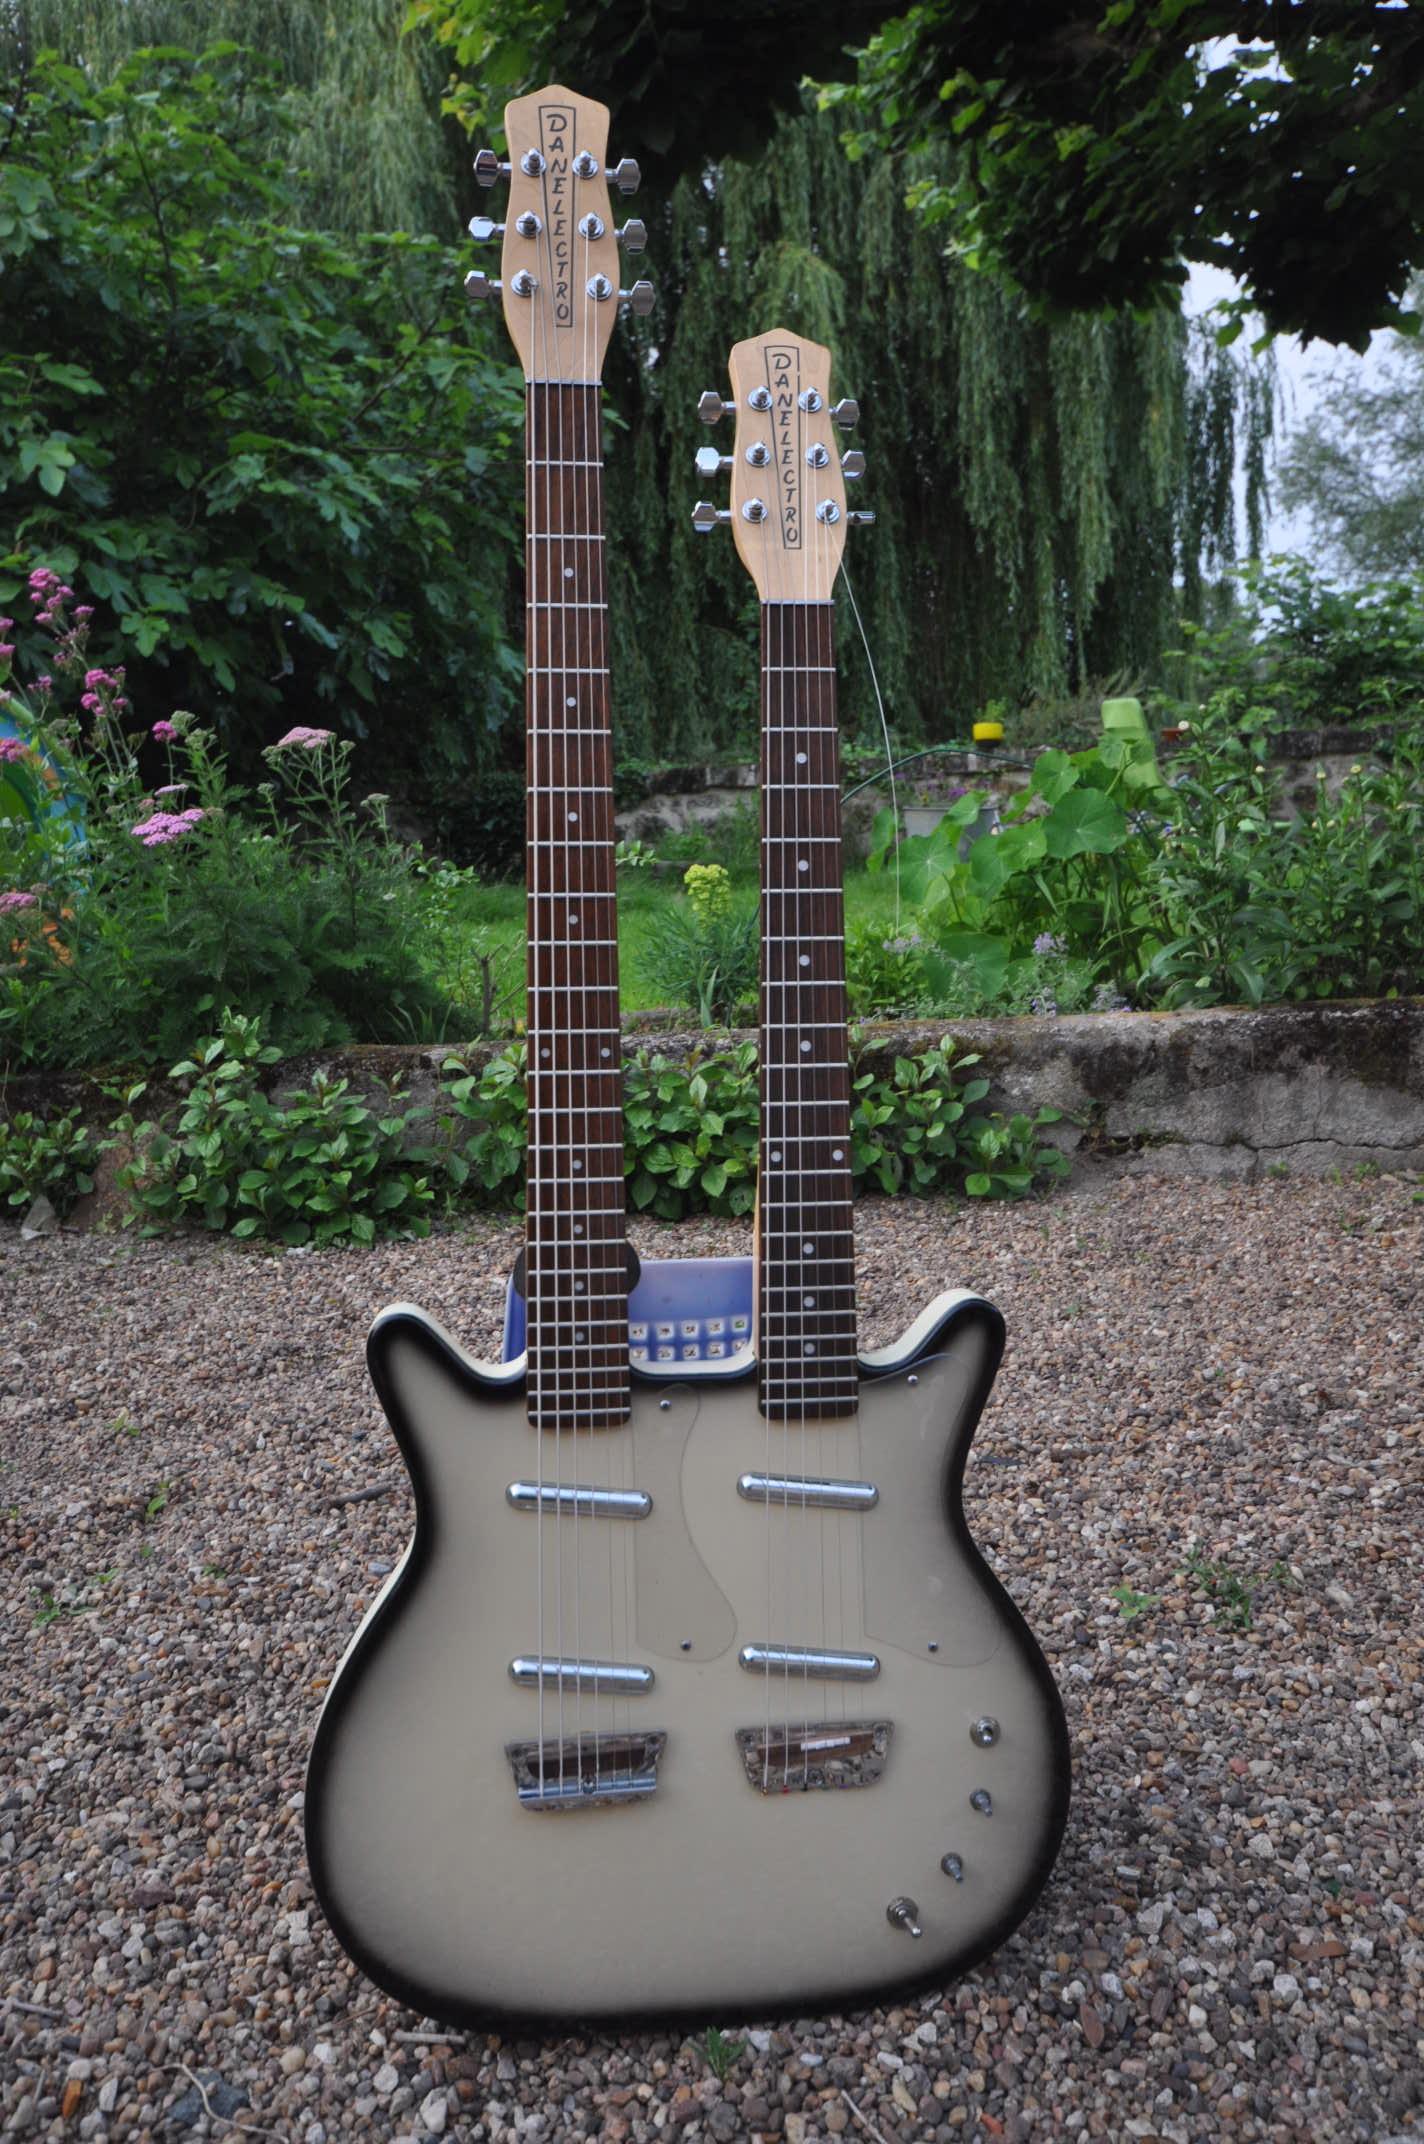 Doubleneck Standard/Baritone Guitar Danelectro - Audiofanzine